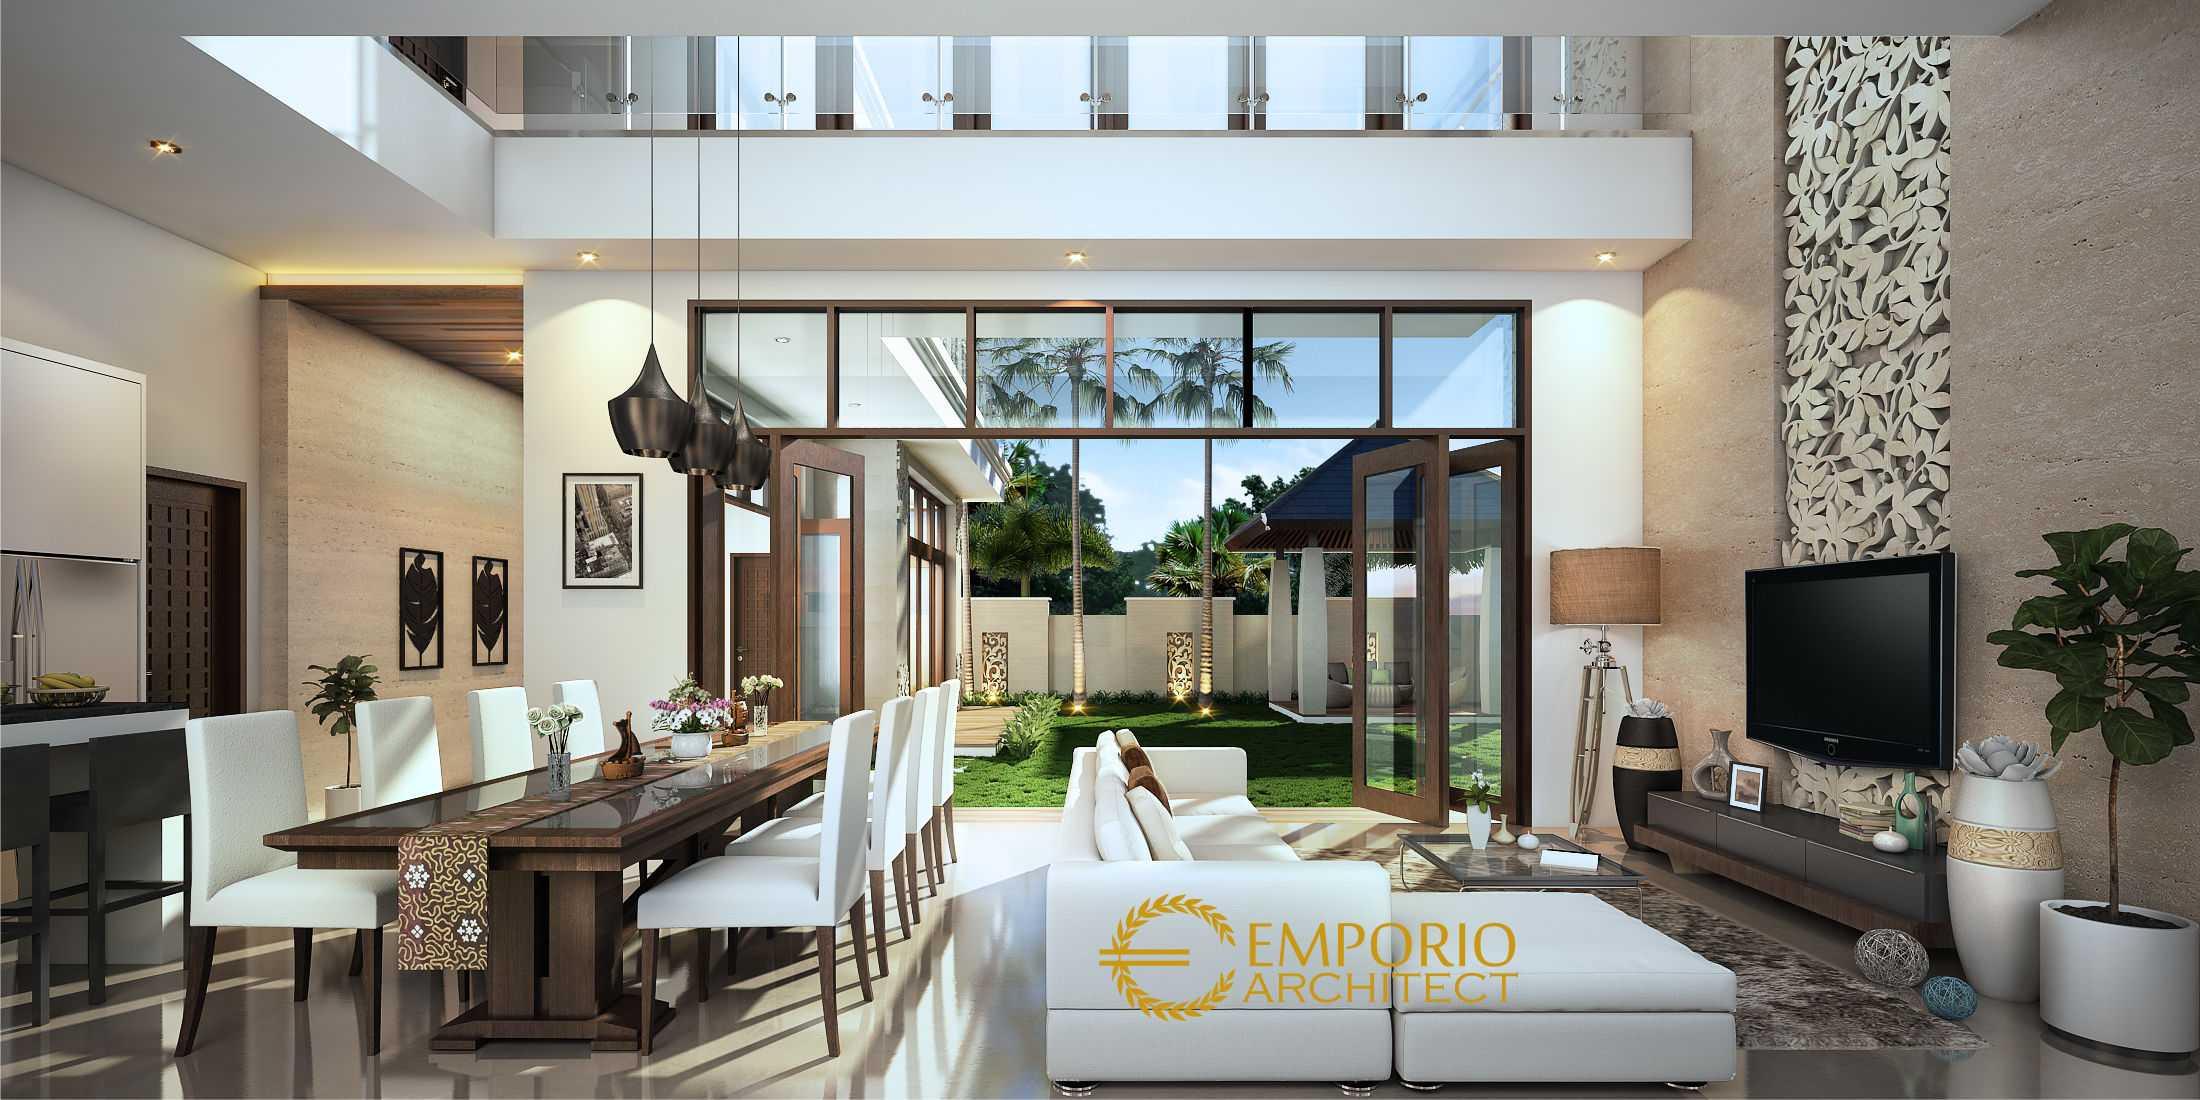 Emporio Architect Jasa Arsitek Makassar Desain Rumah Villa Bali Tropis 225 @ Makassar Makassar, Kota Makassar, Sulawesi Selatan, Indonesia Makassar, Kota Makassar, Sulawesi Selatan, Indonesia Emporio-Architect-Jasa-Arsitek-Makassar-Desain-Rumah-Villa-Bali-Tropis-225-Makassar  84125